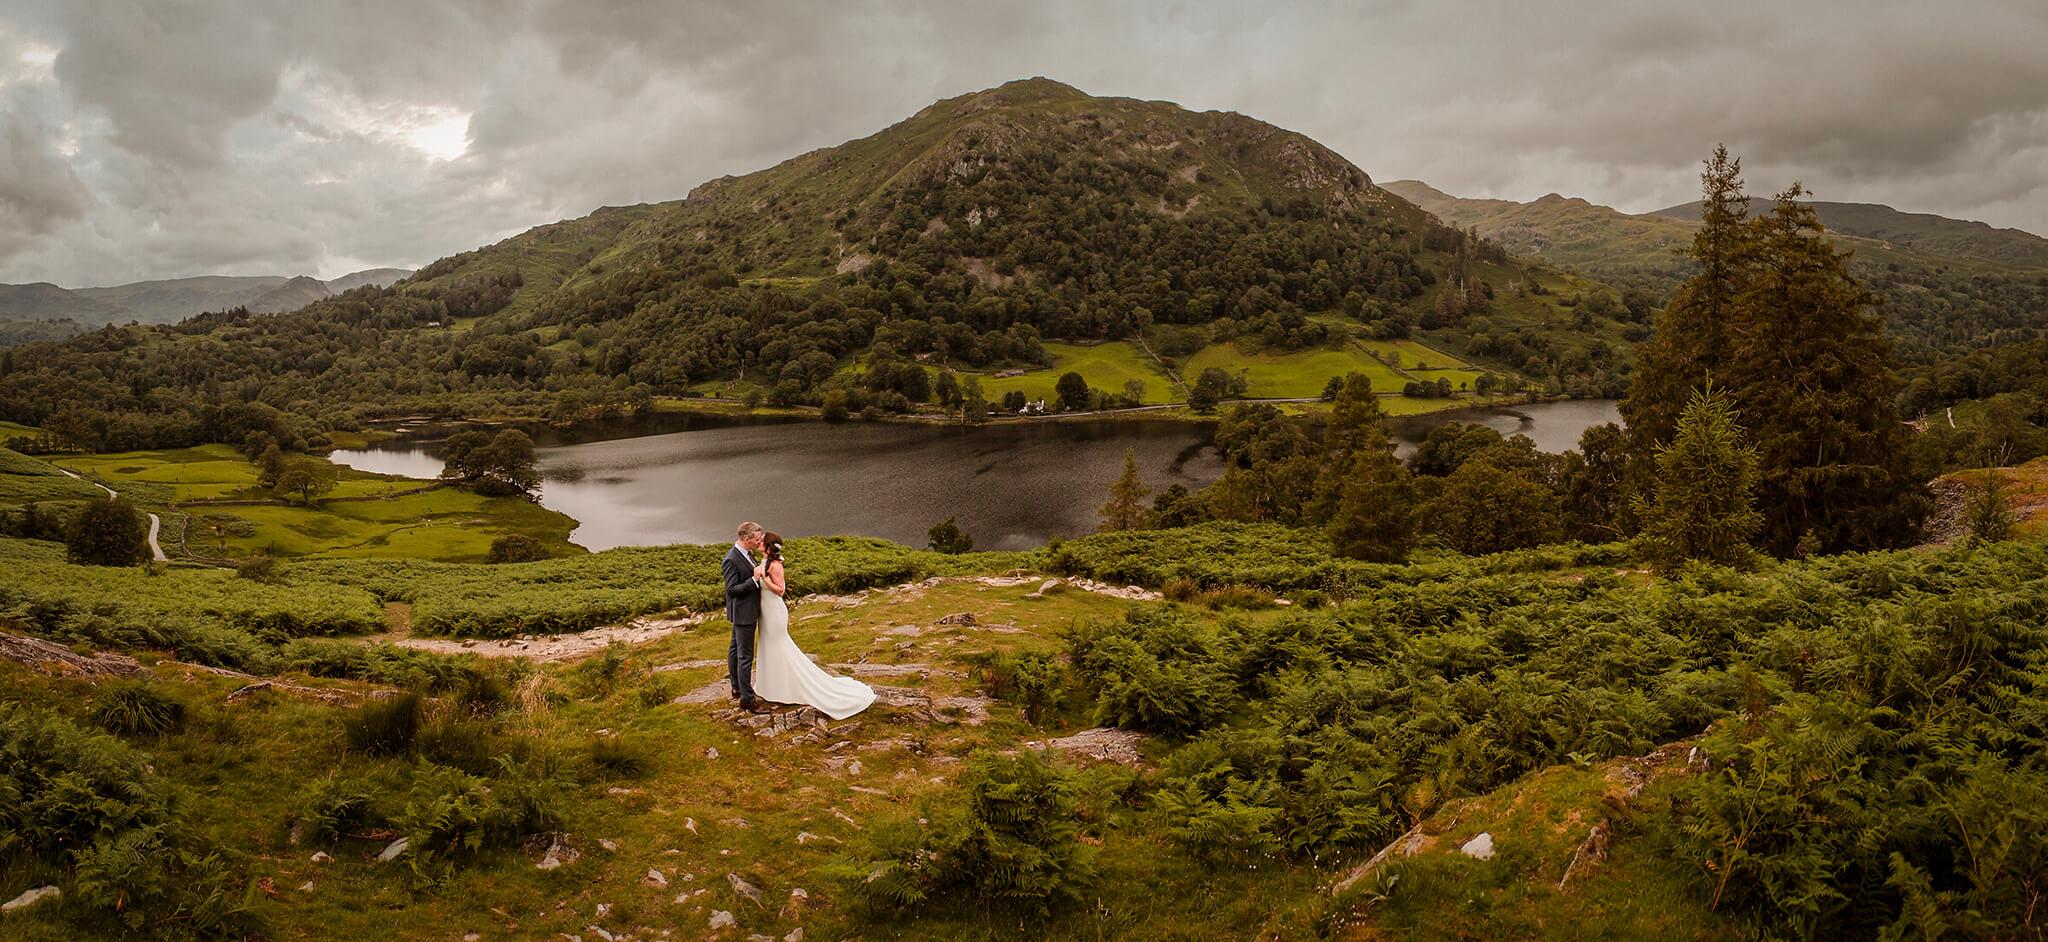 wedding-photograph-lake-district